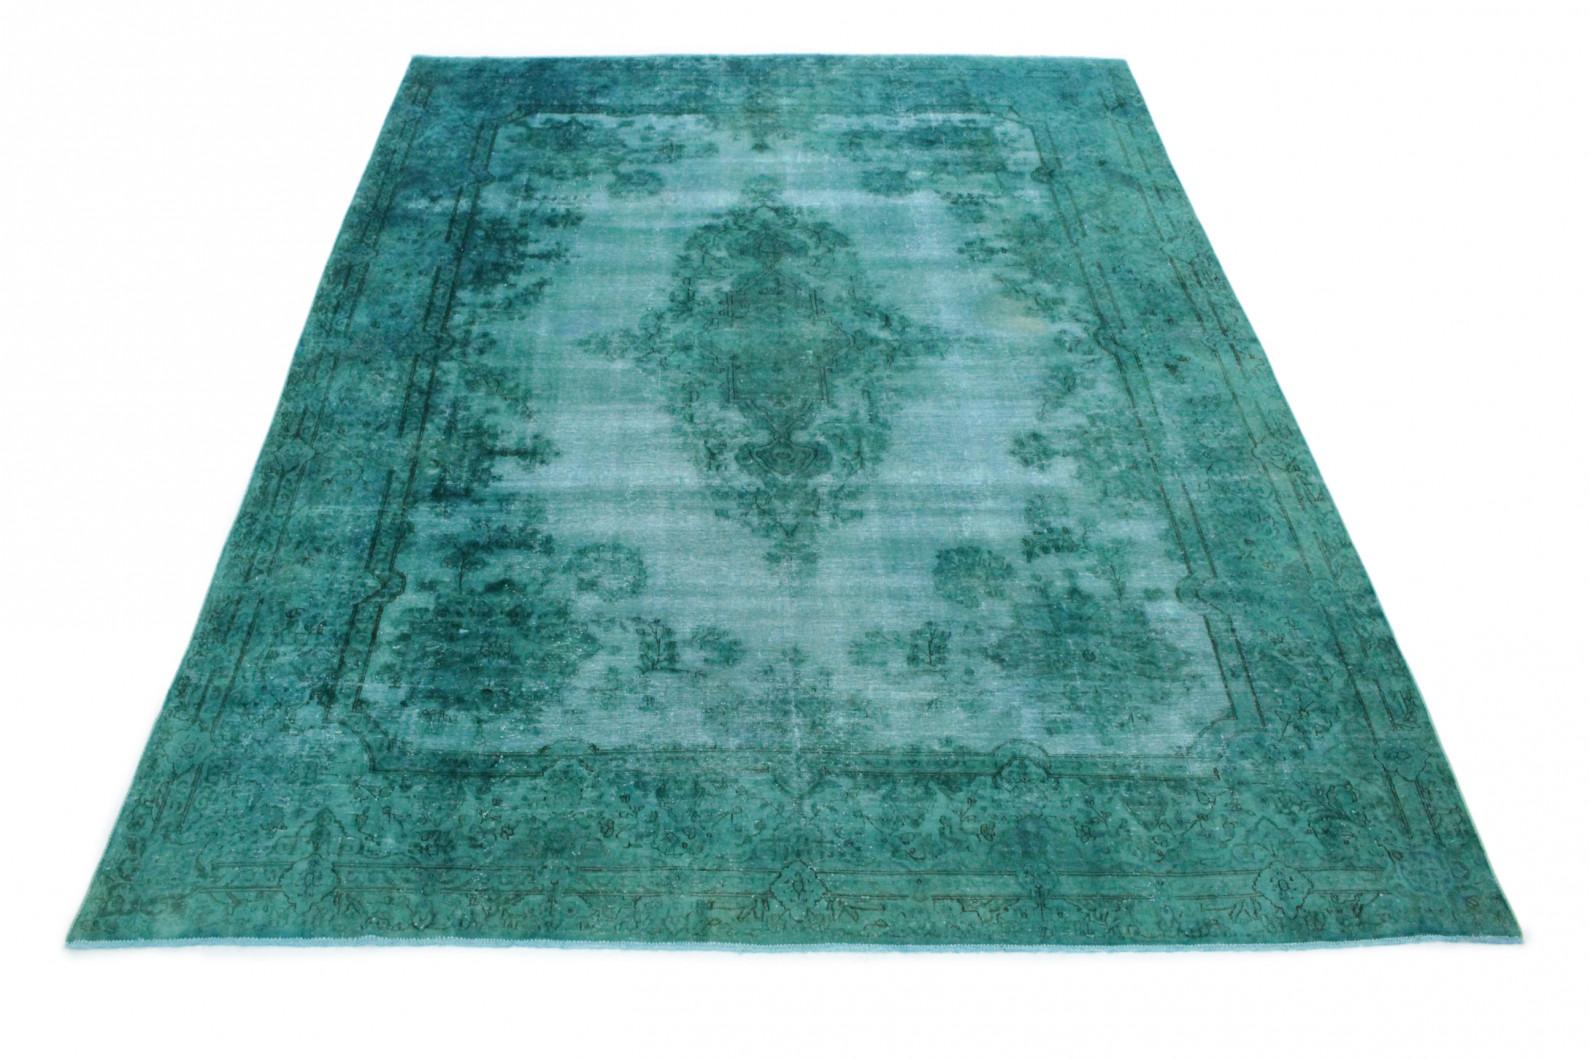 vintage teppich t rkis in 410x300cm 1001 3353 bei kaufen. Black Bedroom Furniture Sets. Home Design Ideas